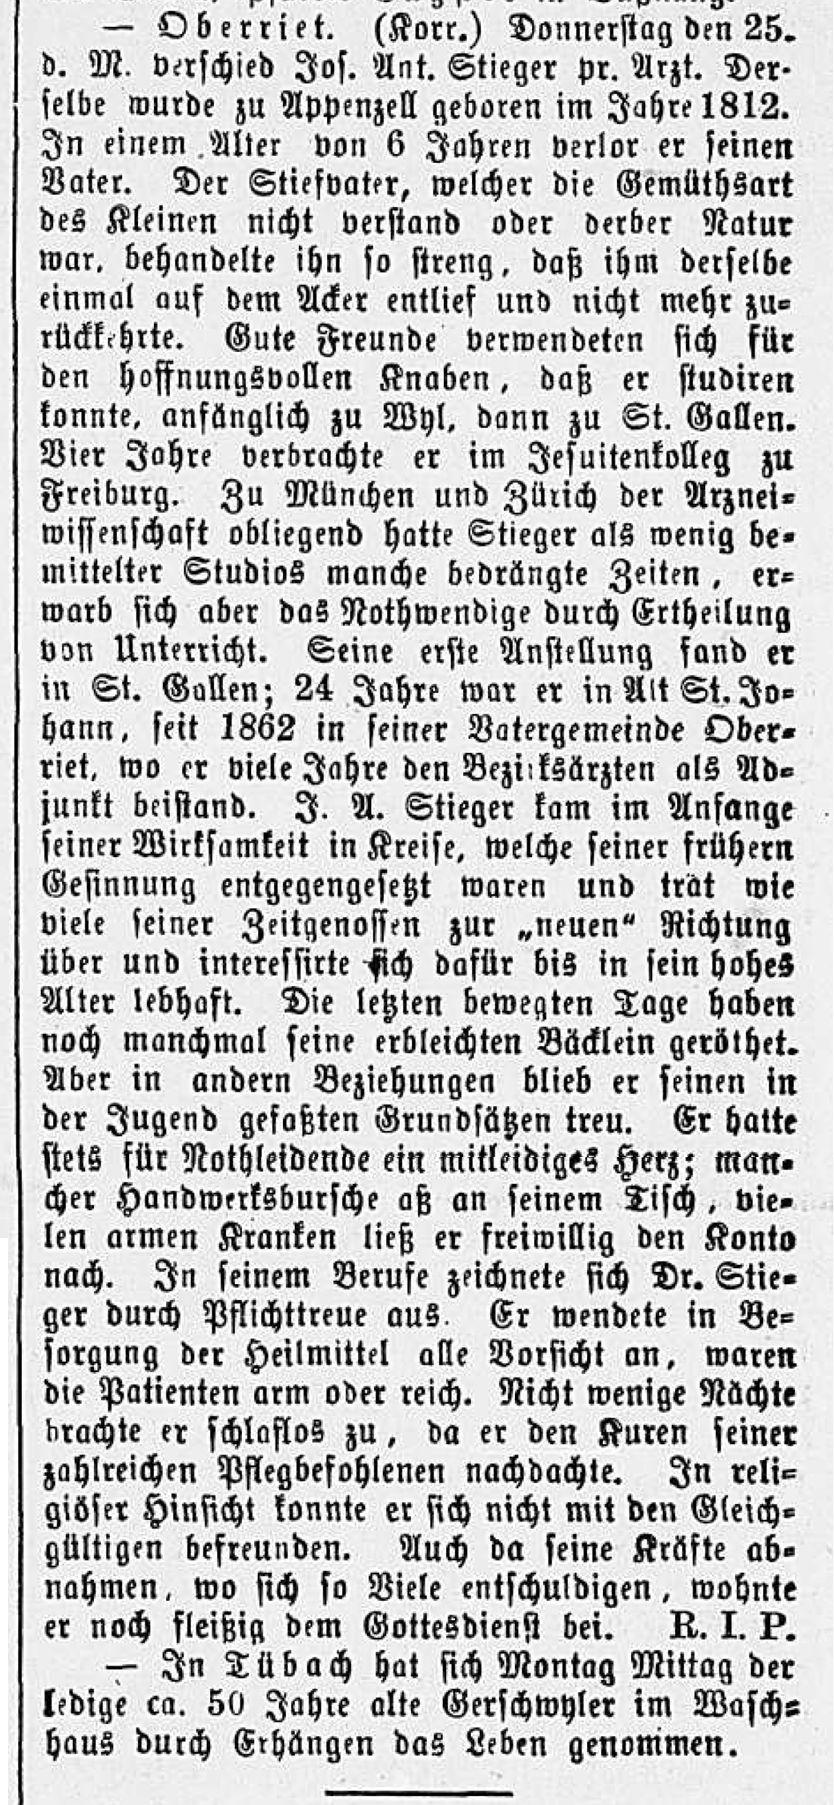 Joseph Stieger, Arzt (1812-1883)